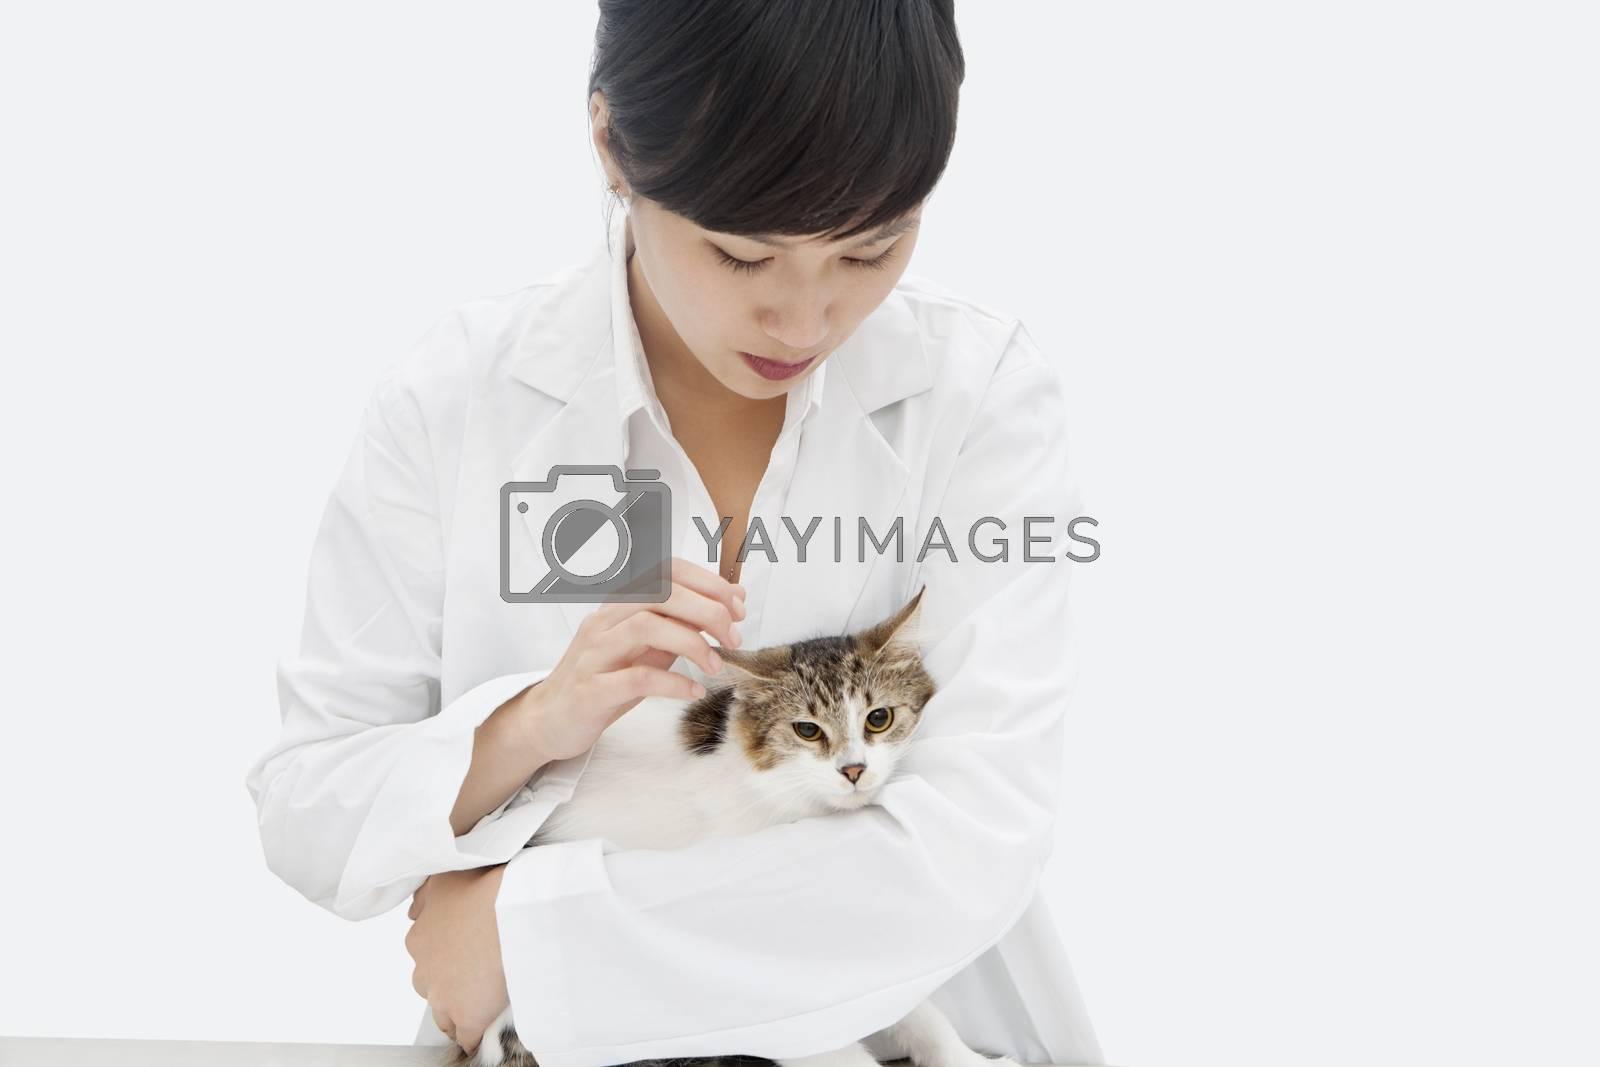 Female veterinarian holding cat against gray background